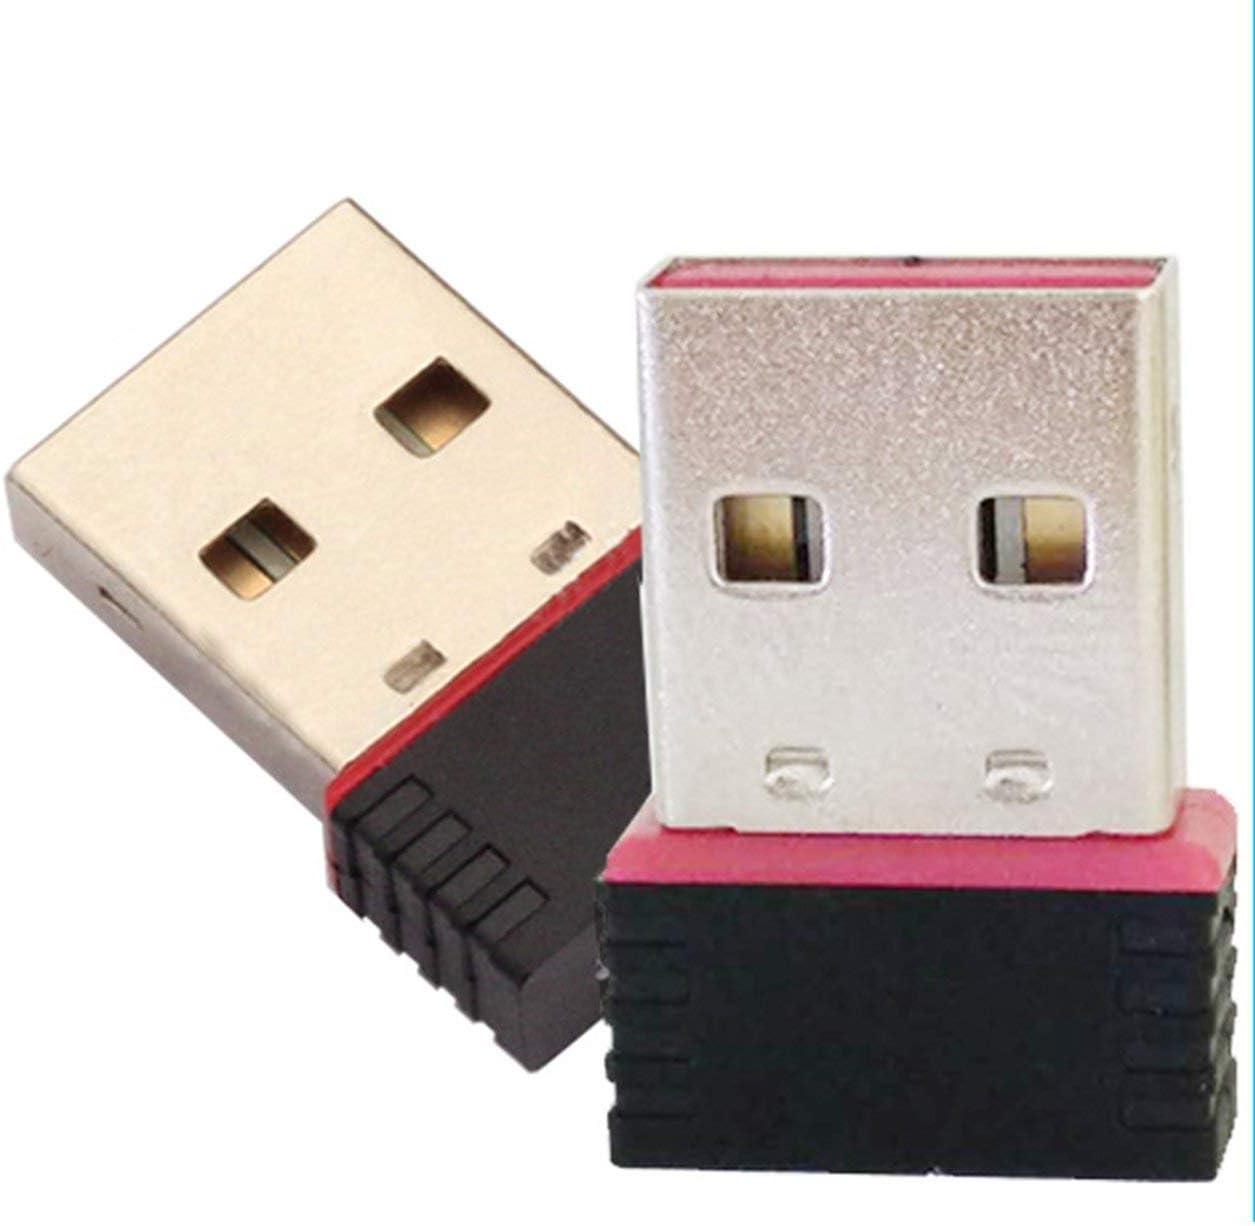 MachinYesity Mini PC Adattatore WiFi Antenna WiFi USB Scheda di Rete per Computer Wireless Mini Scheda di Rete per Computer Wireless Ricevitore Dual Band Colore: Nero